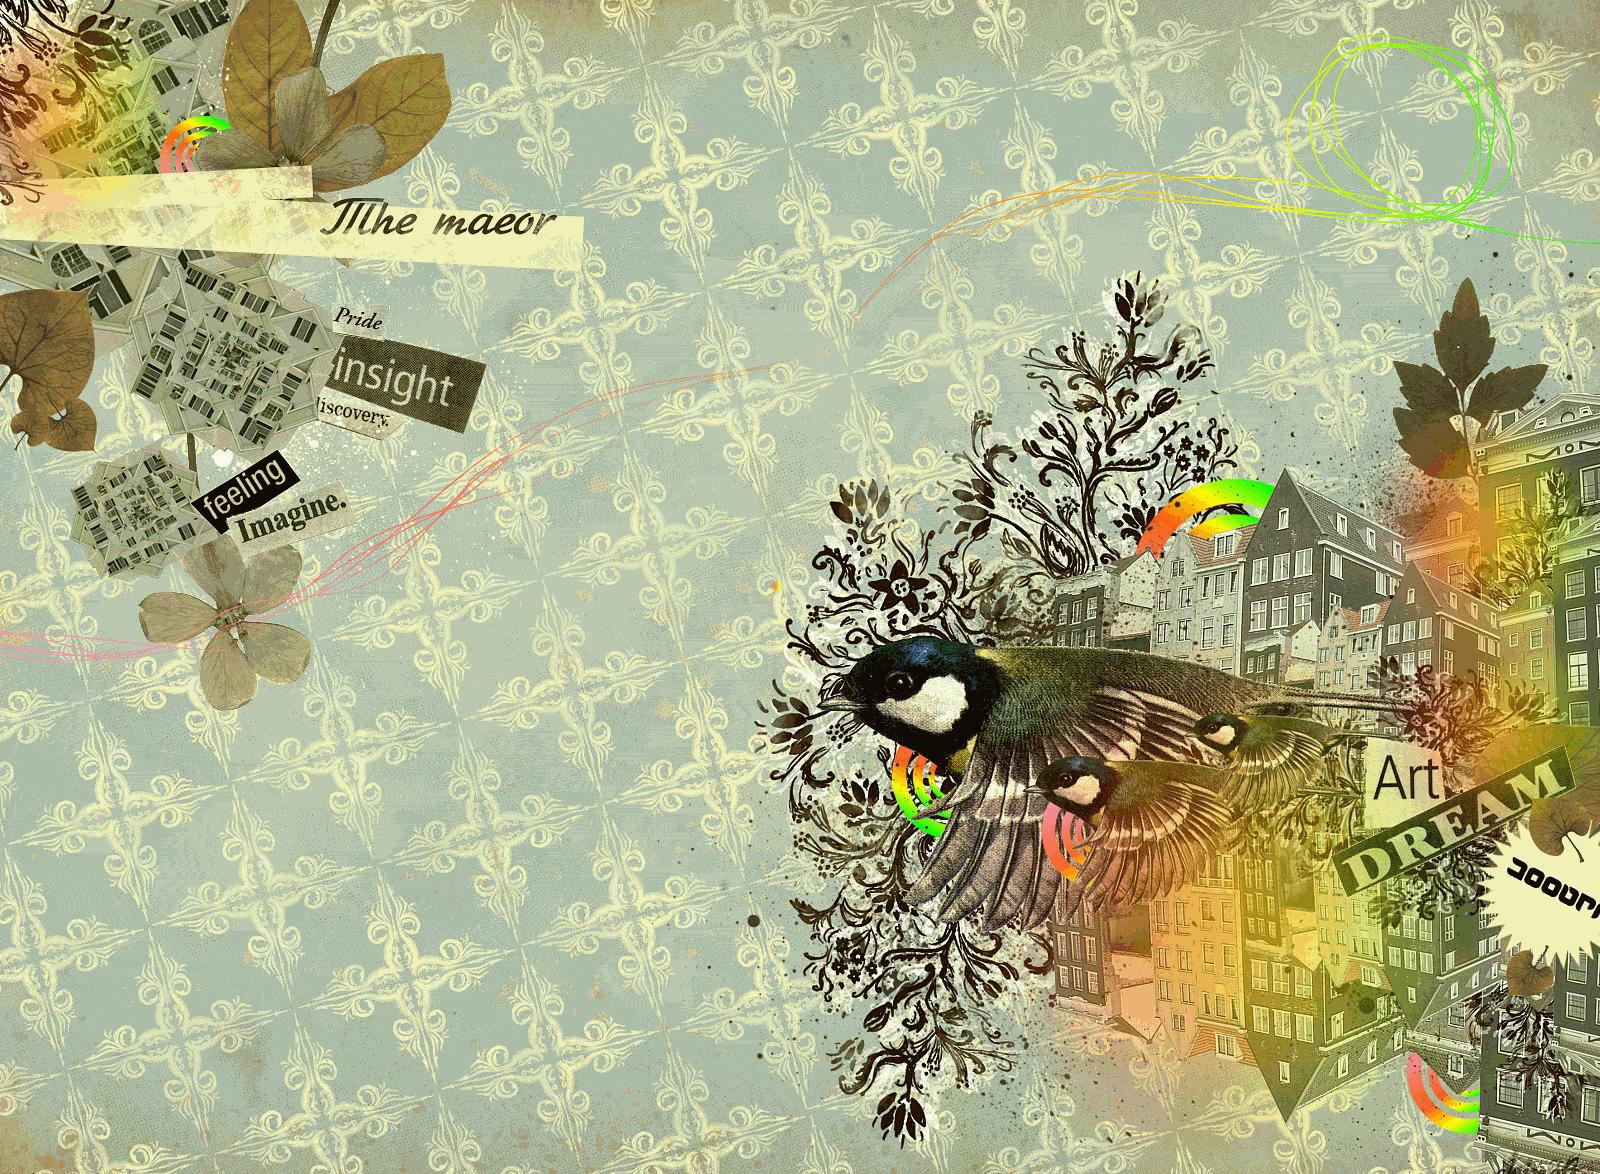 kane blog picz: Vintage Desktop Wallpapers Hd